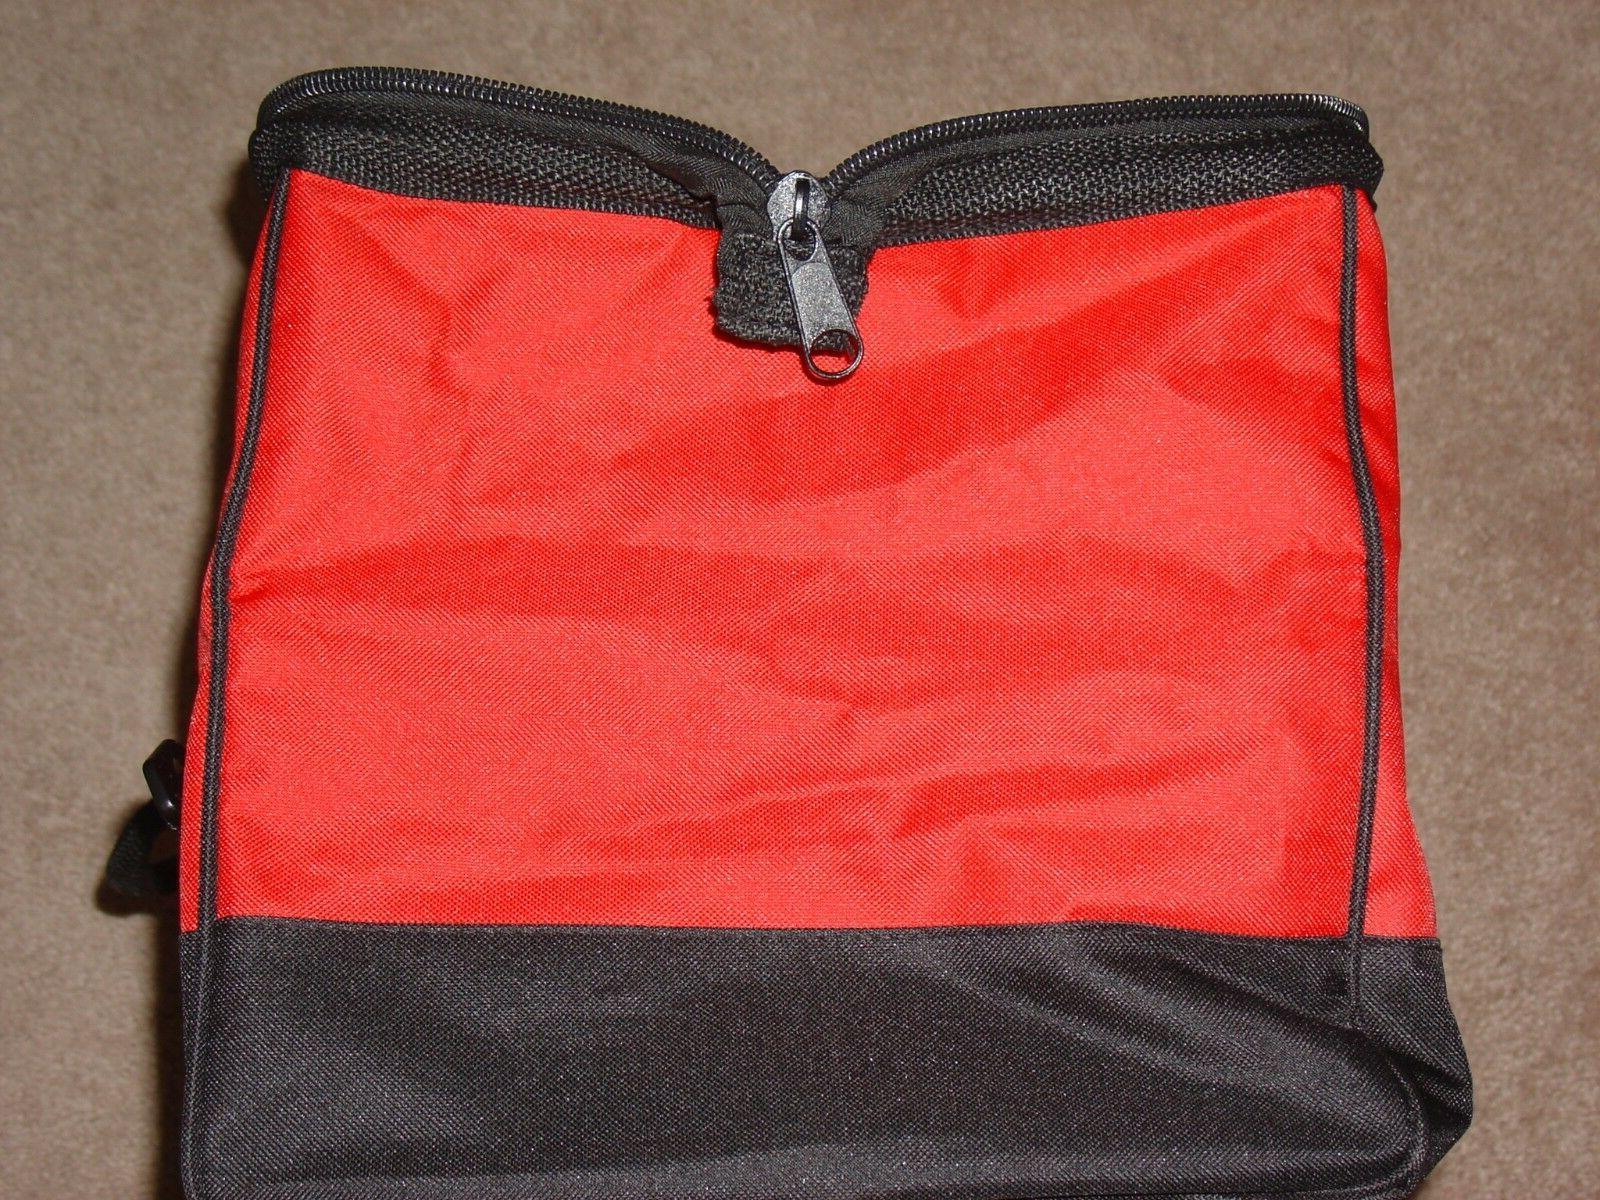 "New Duty Bag 22""L X 12""H W/O Strap"